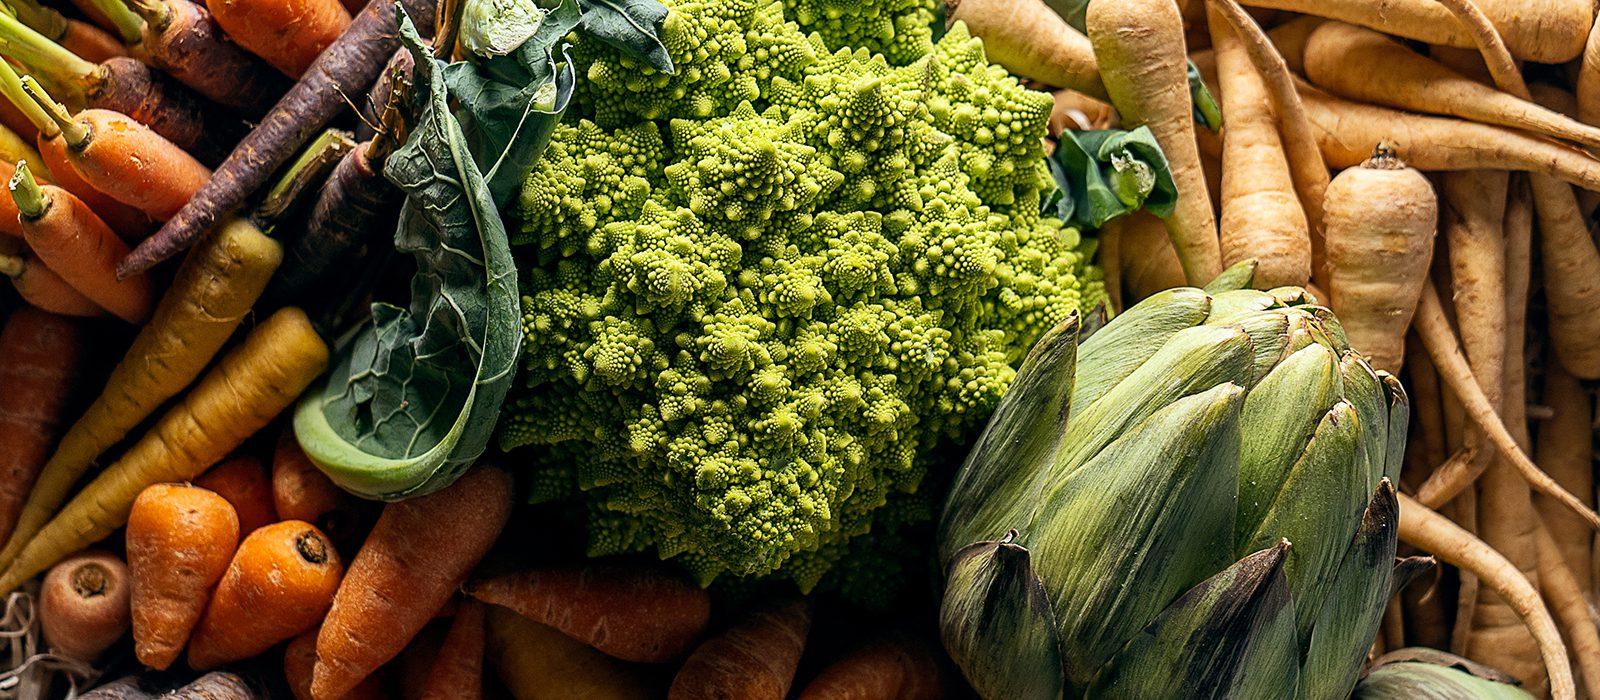 Yarnton Home & Garden, Kidlington, Oxford - Fresh Produce for Sale